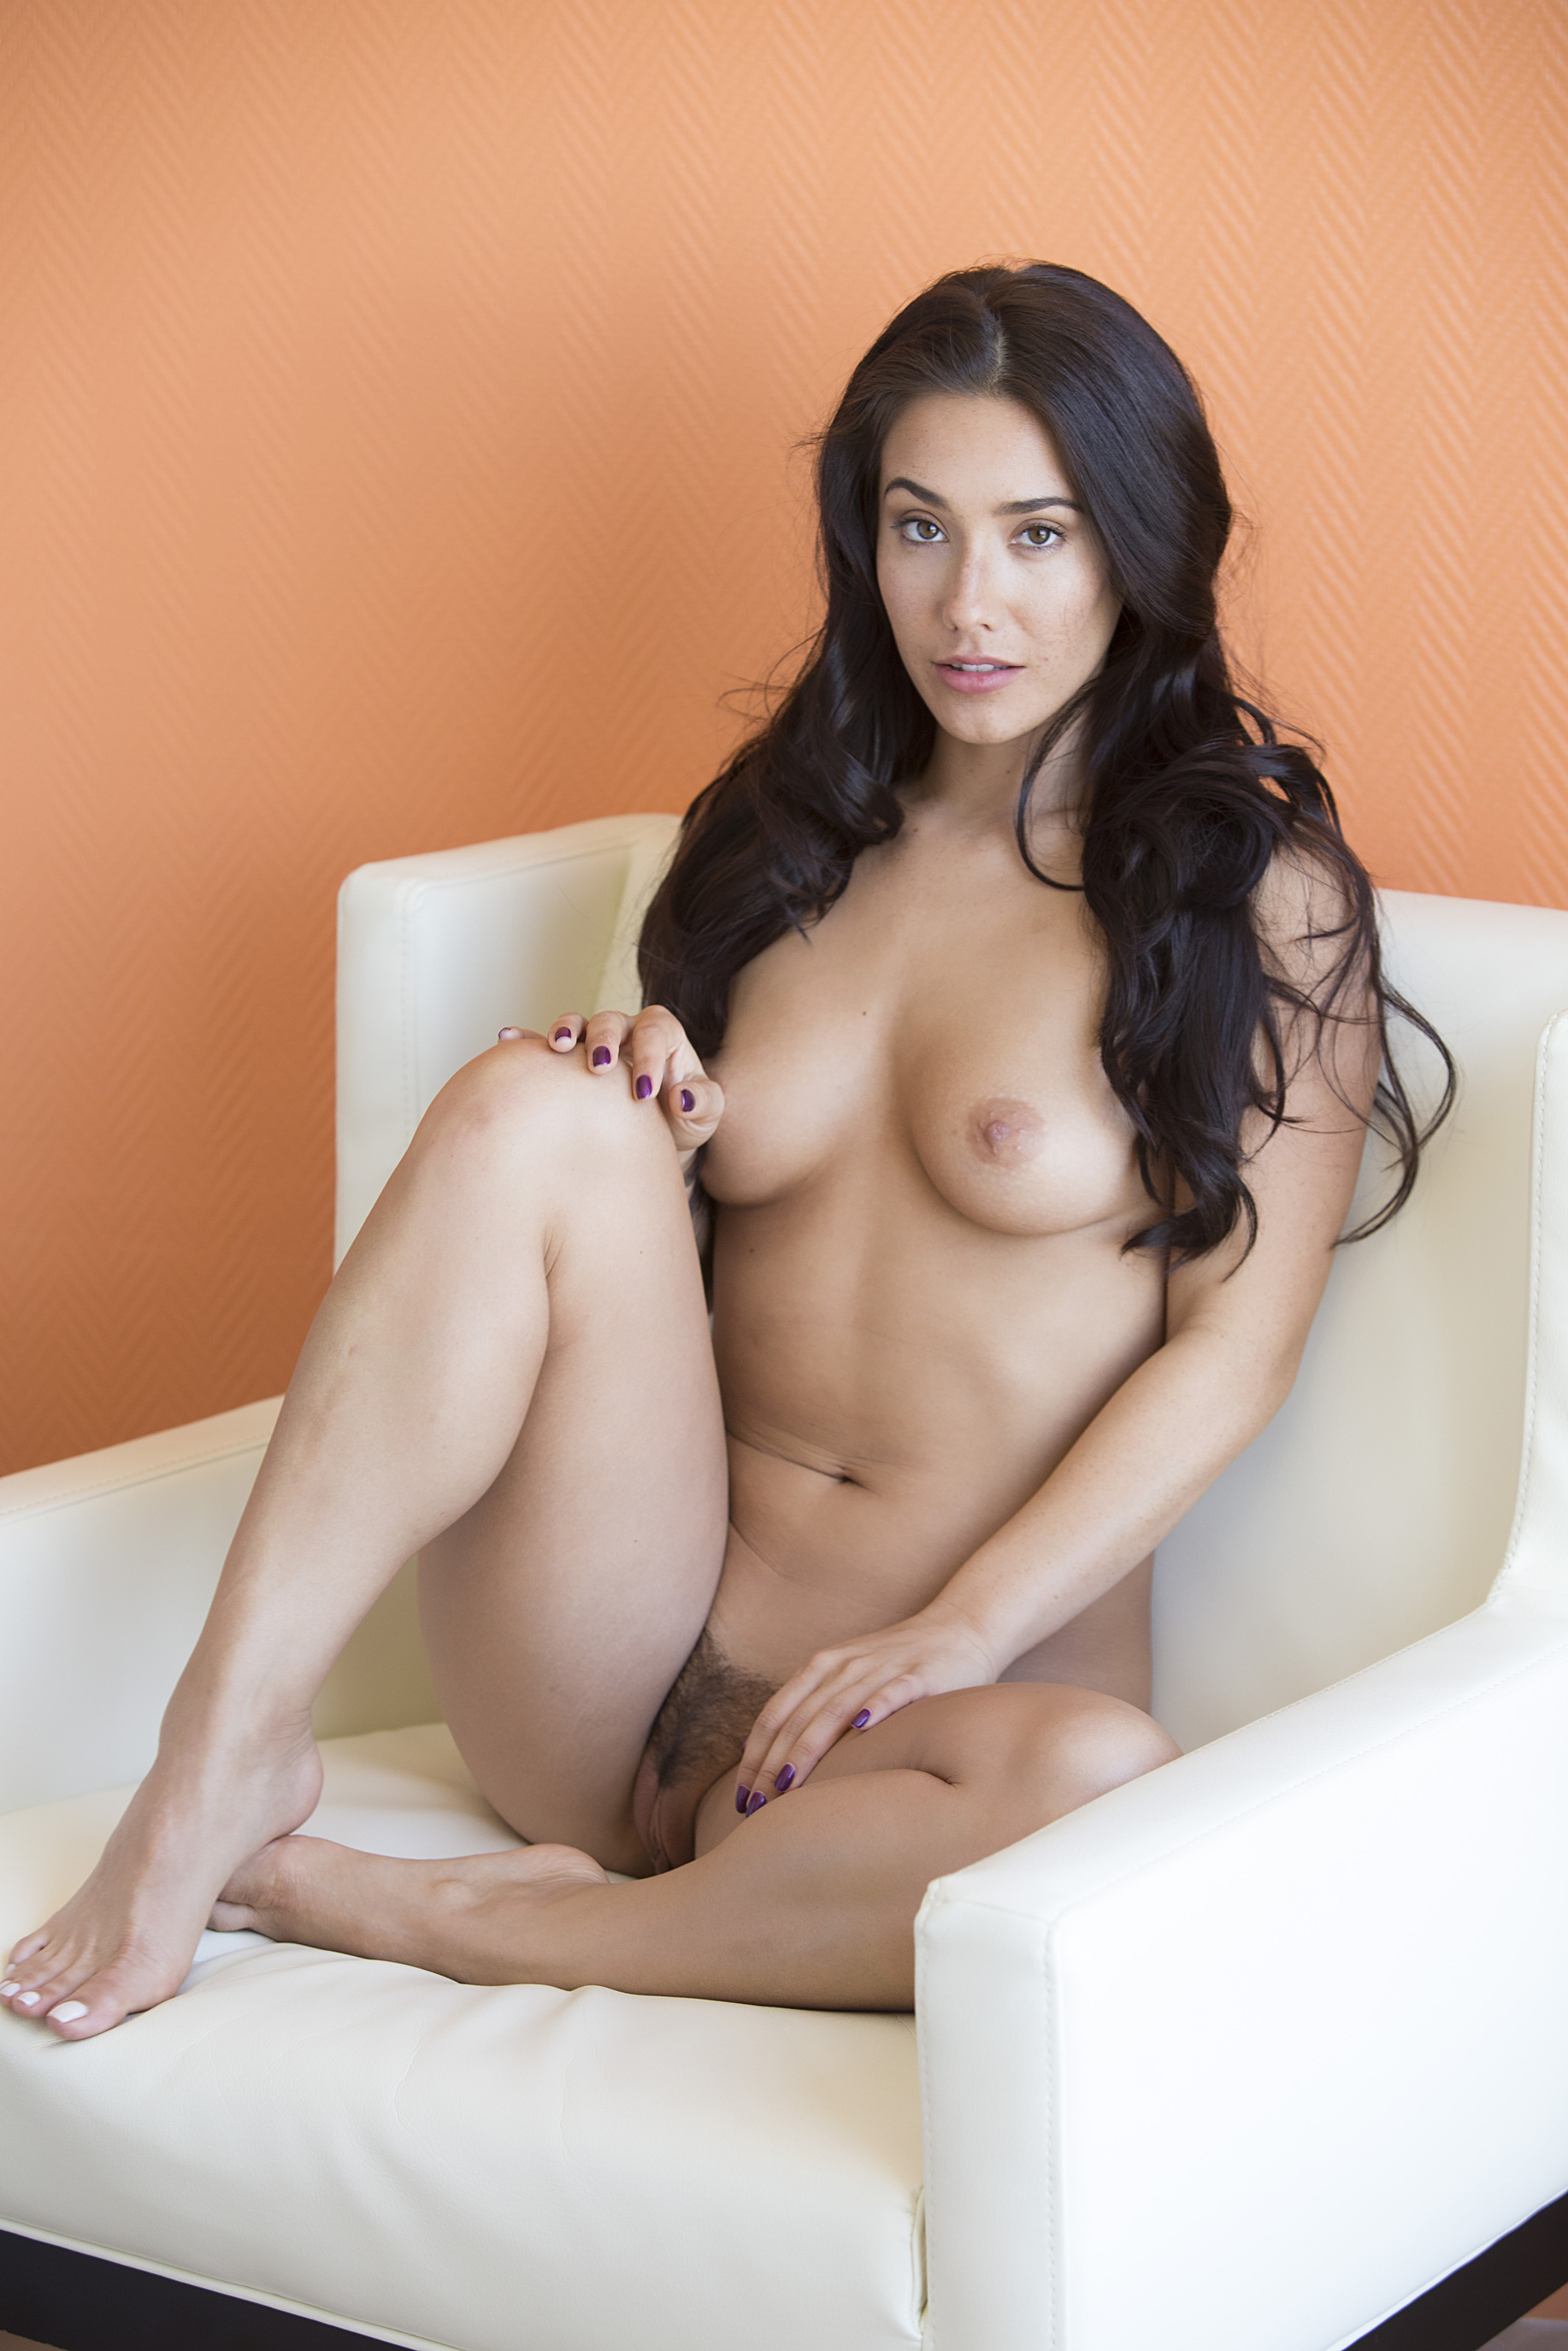 Hot blonde lexi belle pov casting couch csm - 1 5